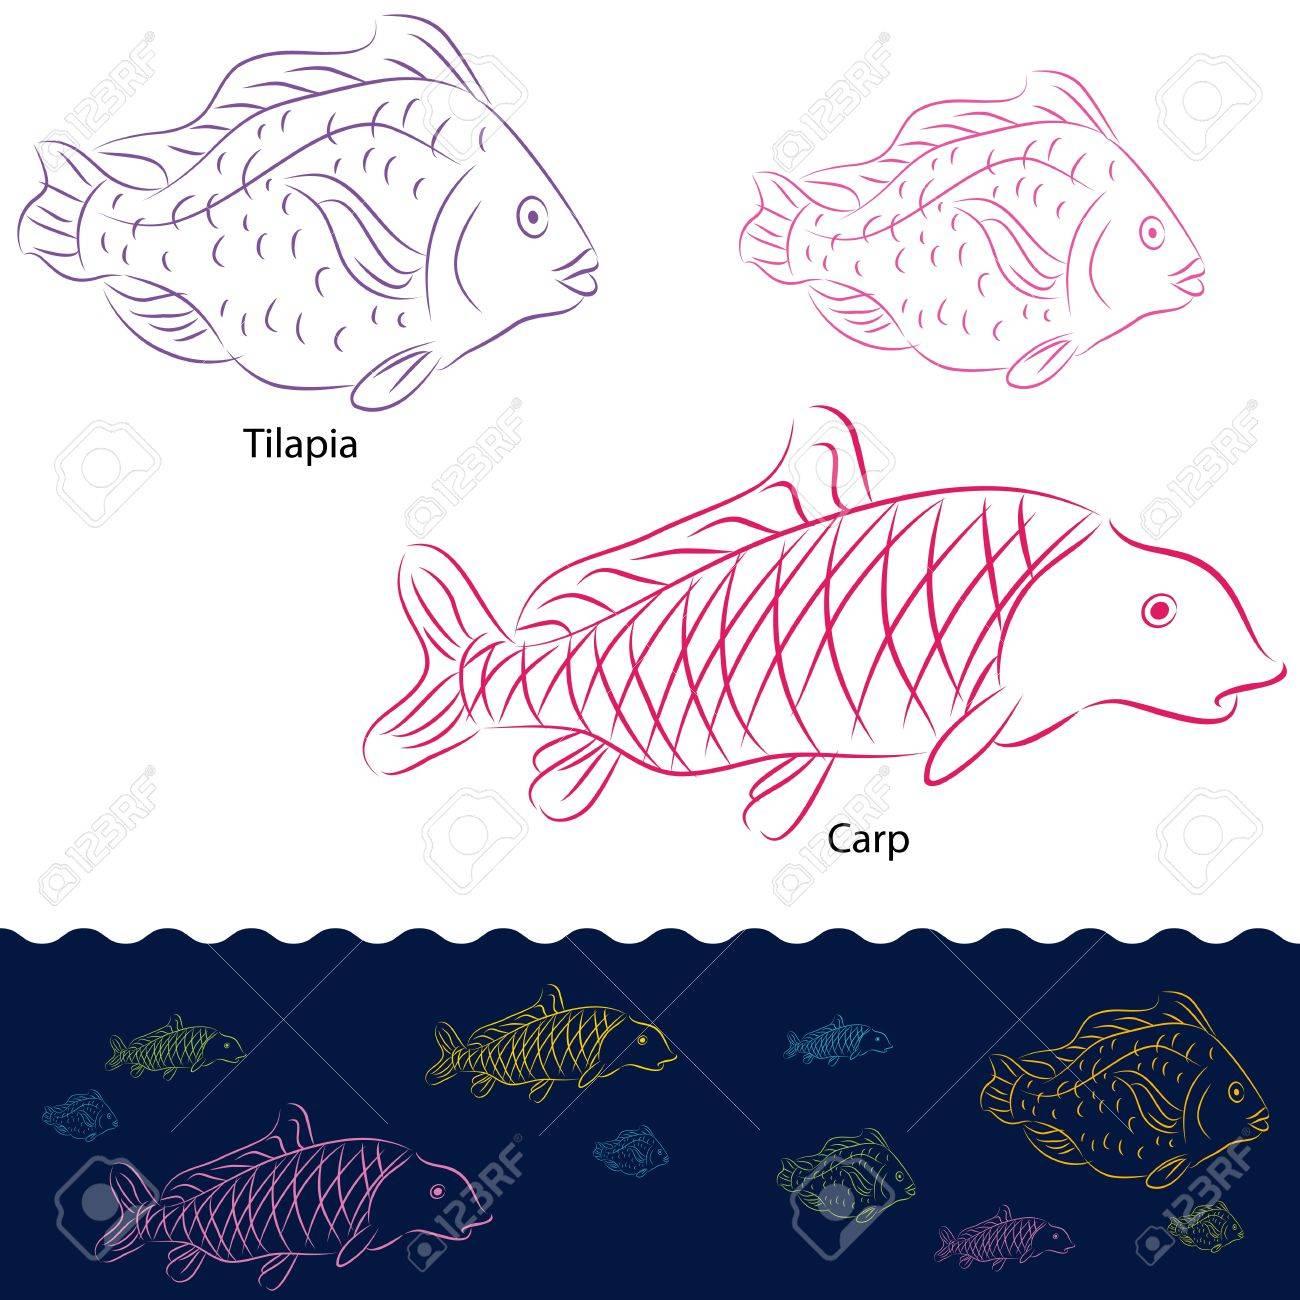 1300x1300 An Image Of A Tilapia And Carp Fish Set. Royalty Free Cliparts